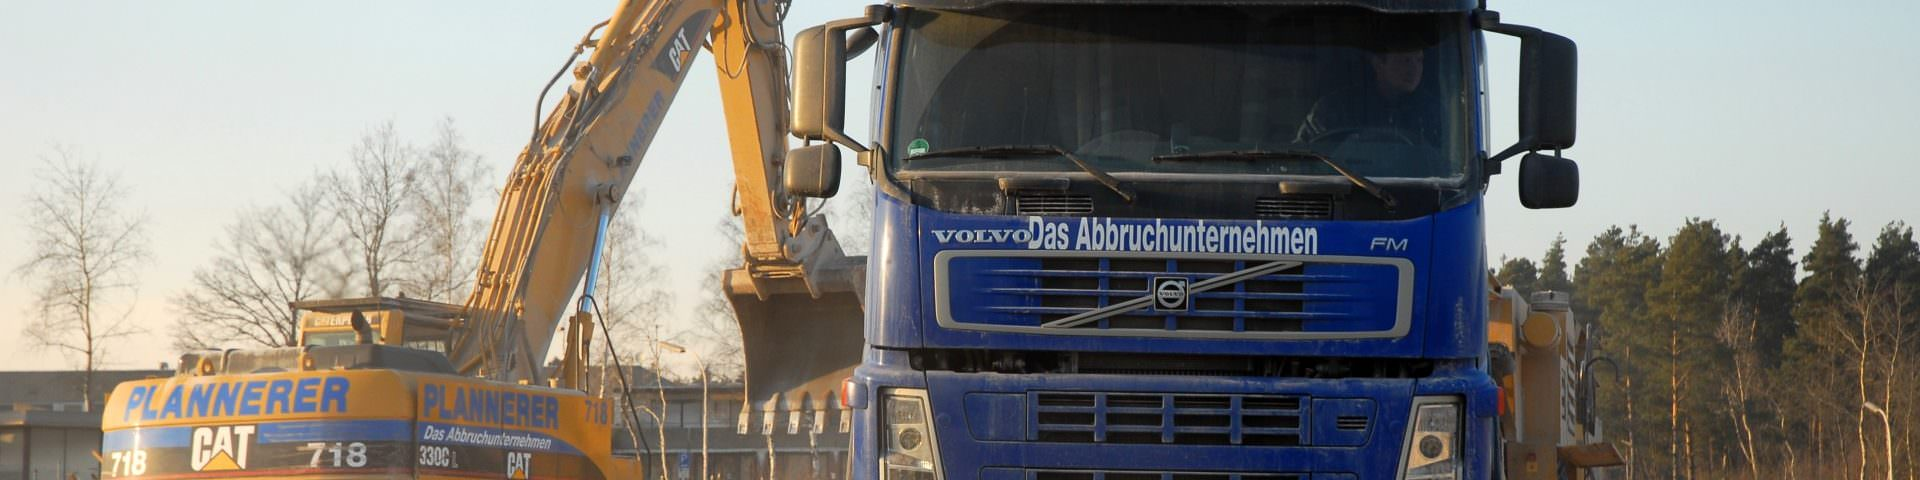 Plannerer Abbruch Autobahnbrücke